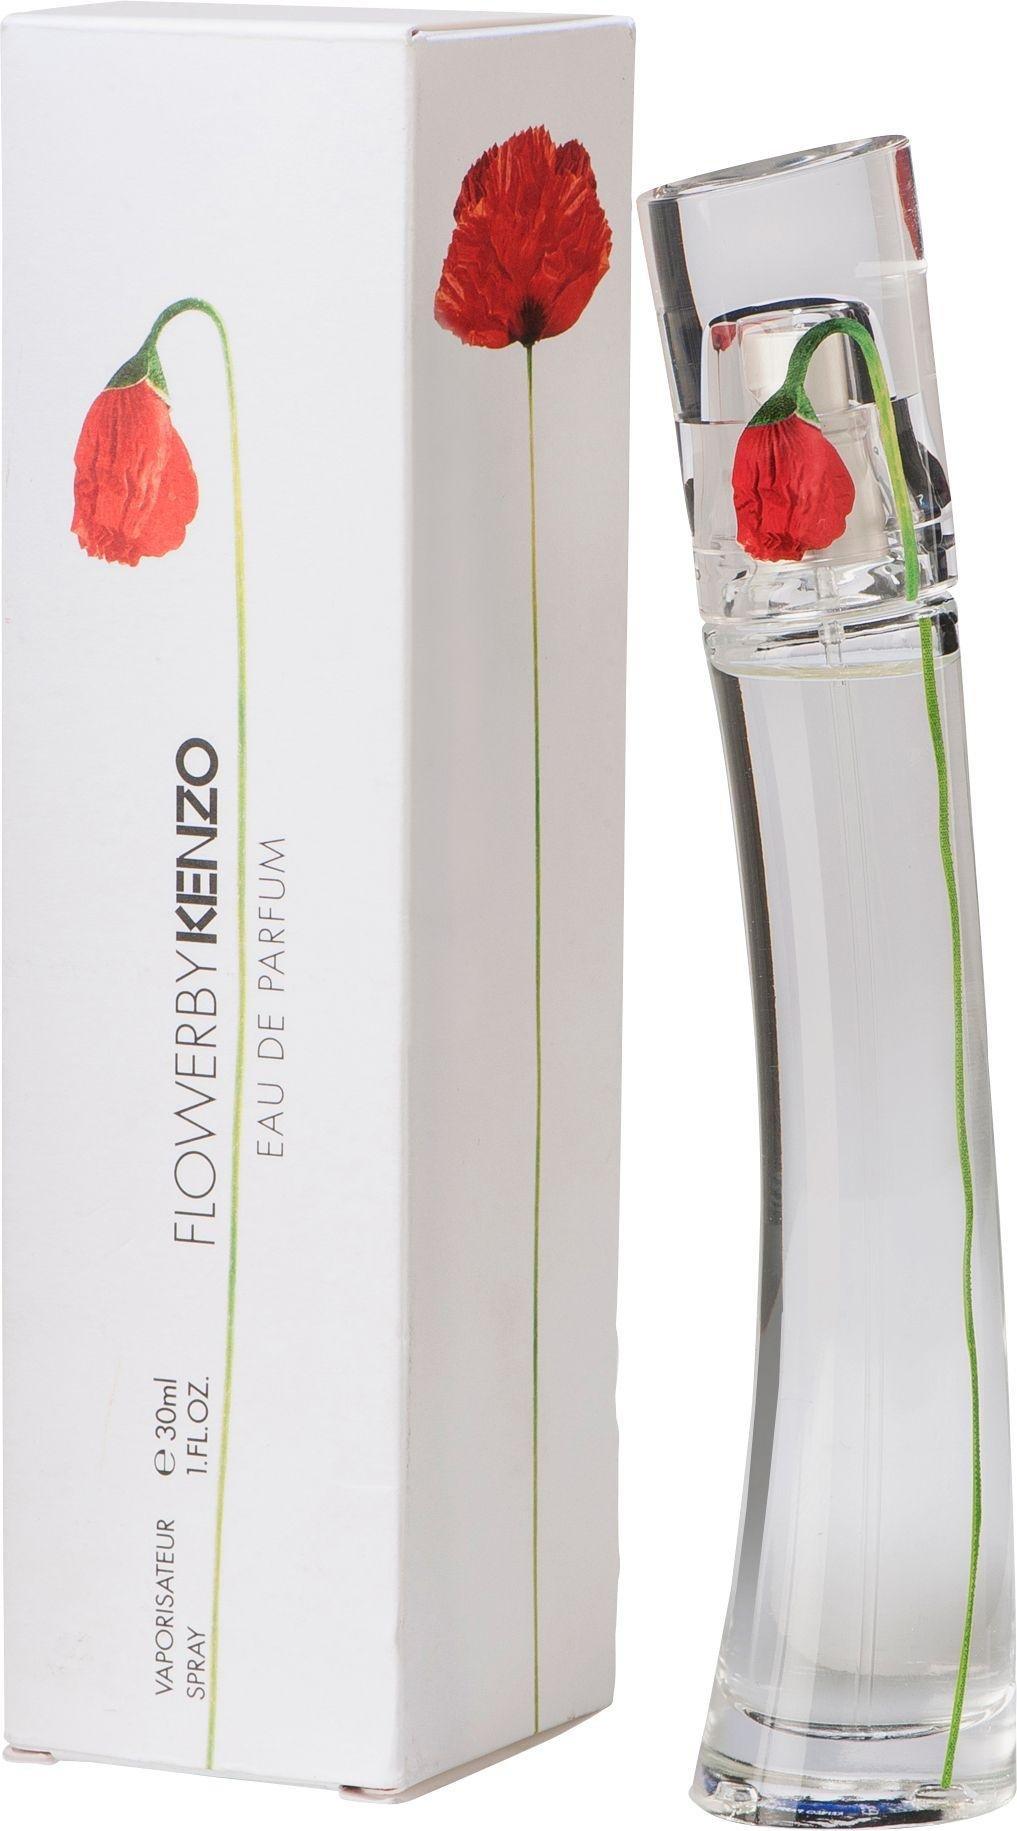 Kenzo Flower for Women Eau de Parfum - 30ml